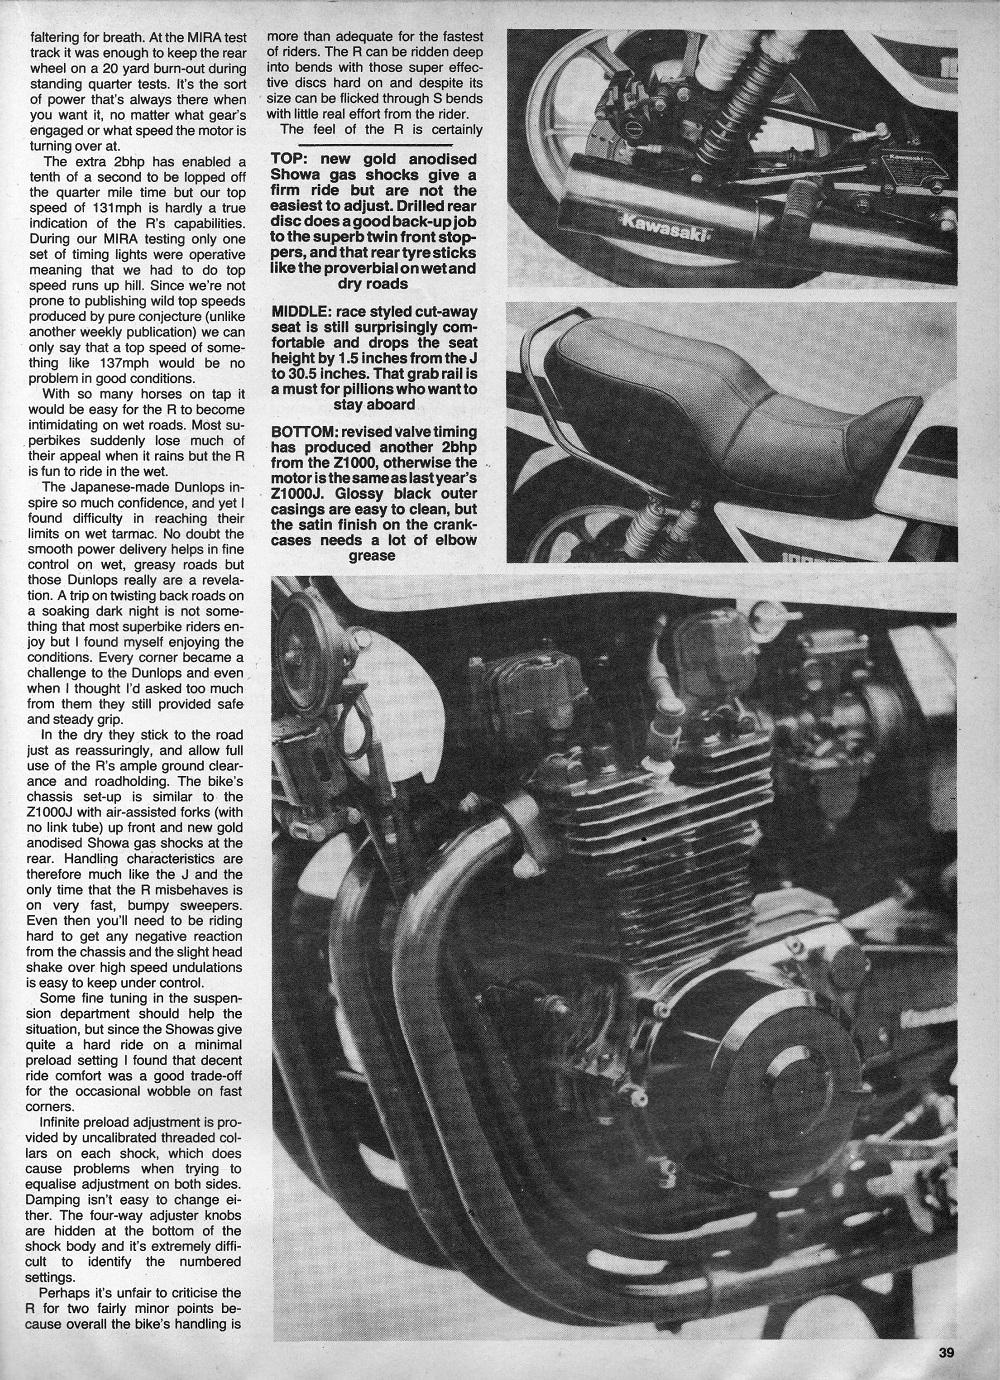 1983 Kawasaki Z 1000R road test.3.jpg